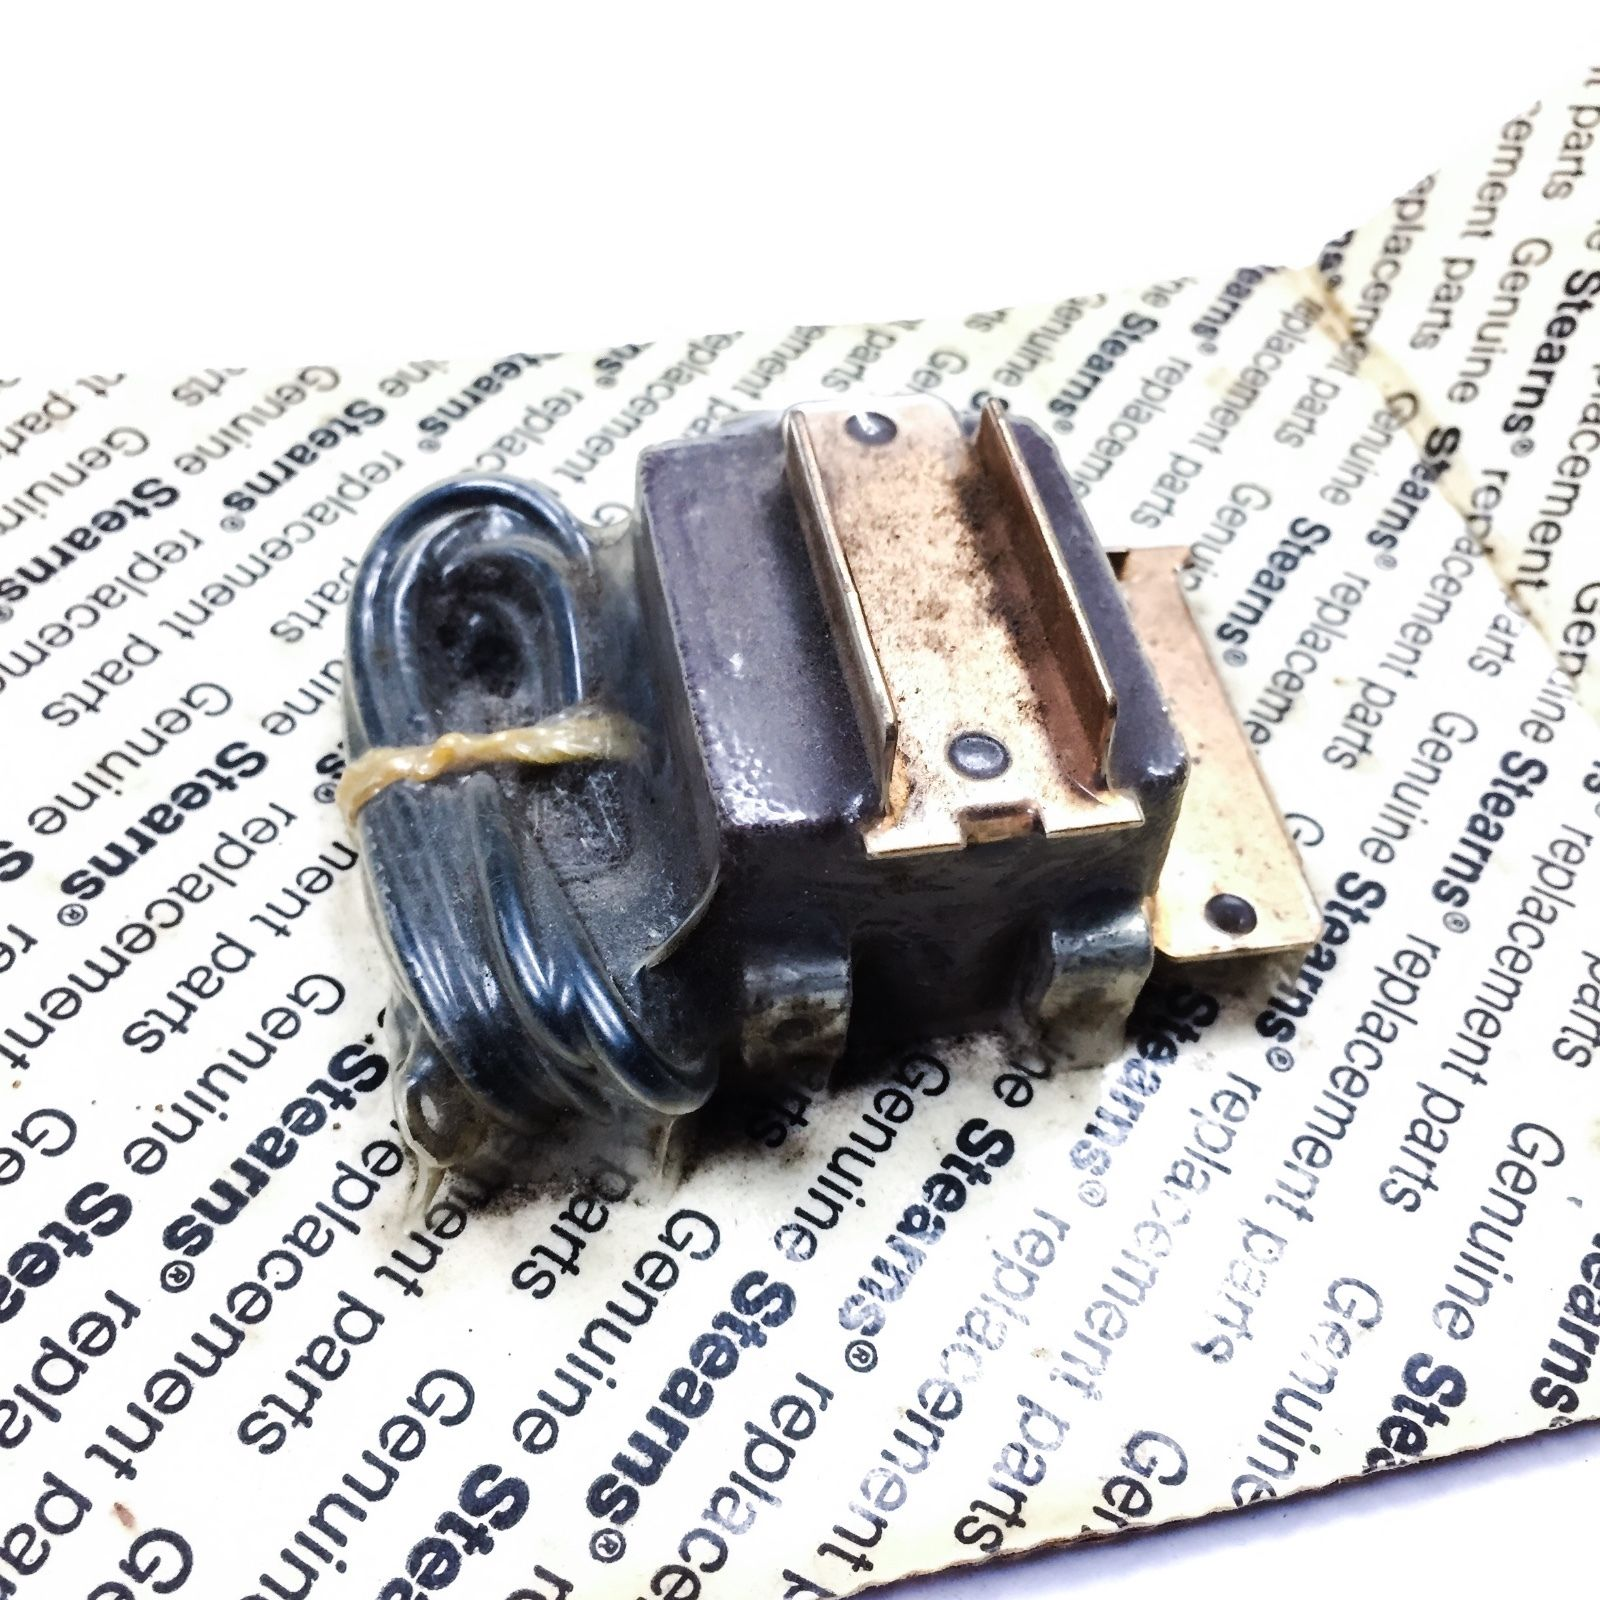 stearns brake wiring diagram tahoe parts 61423061 coil kit